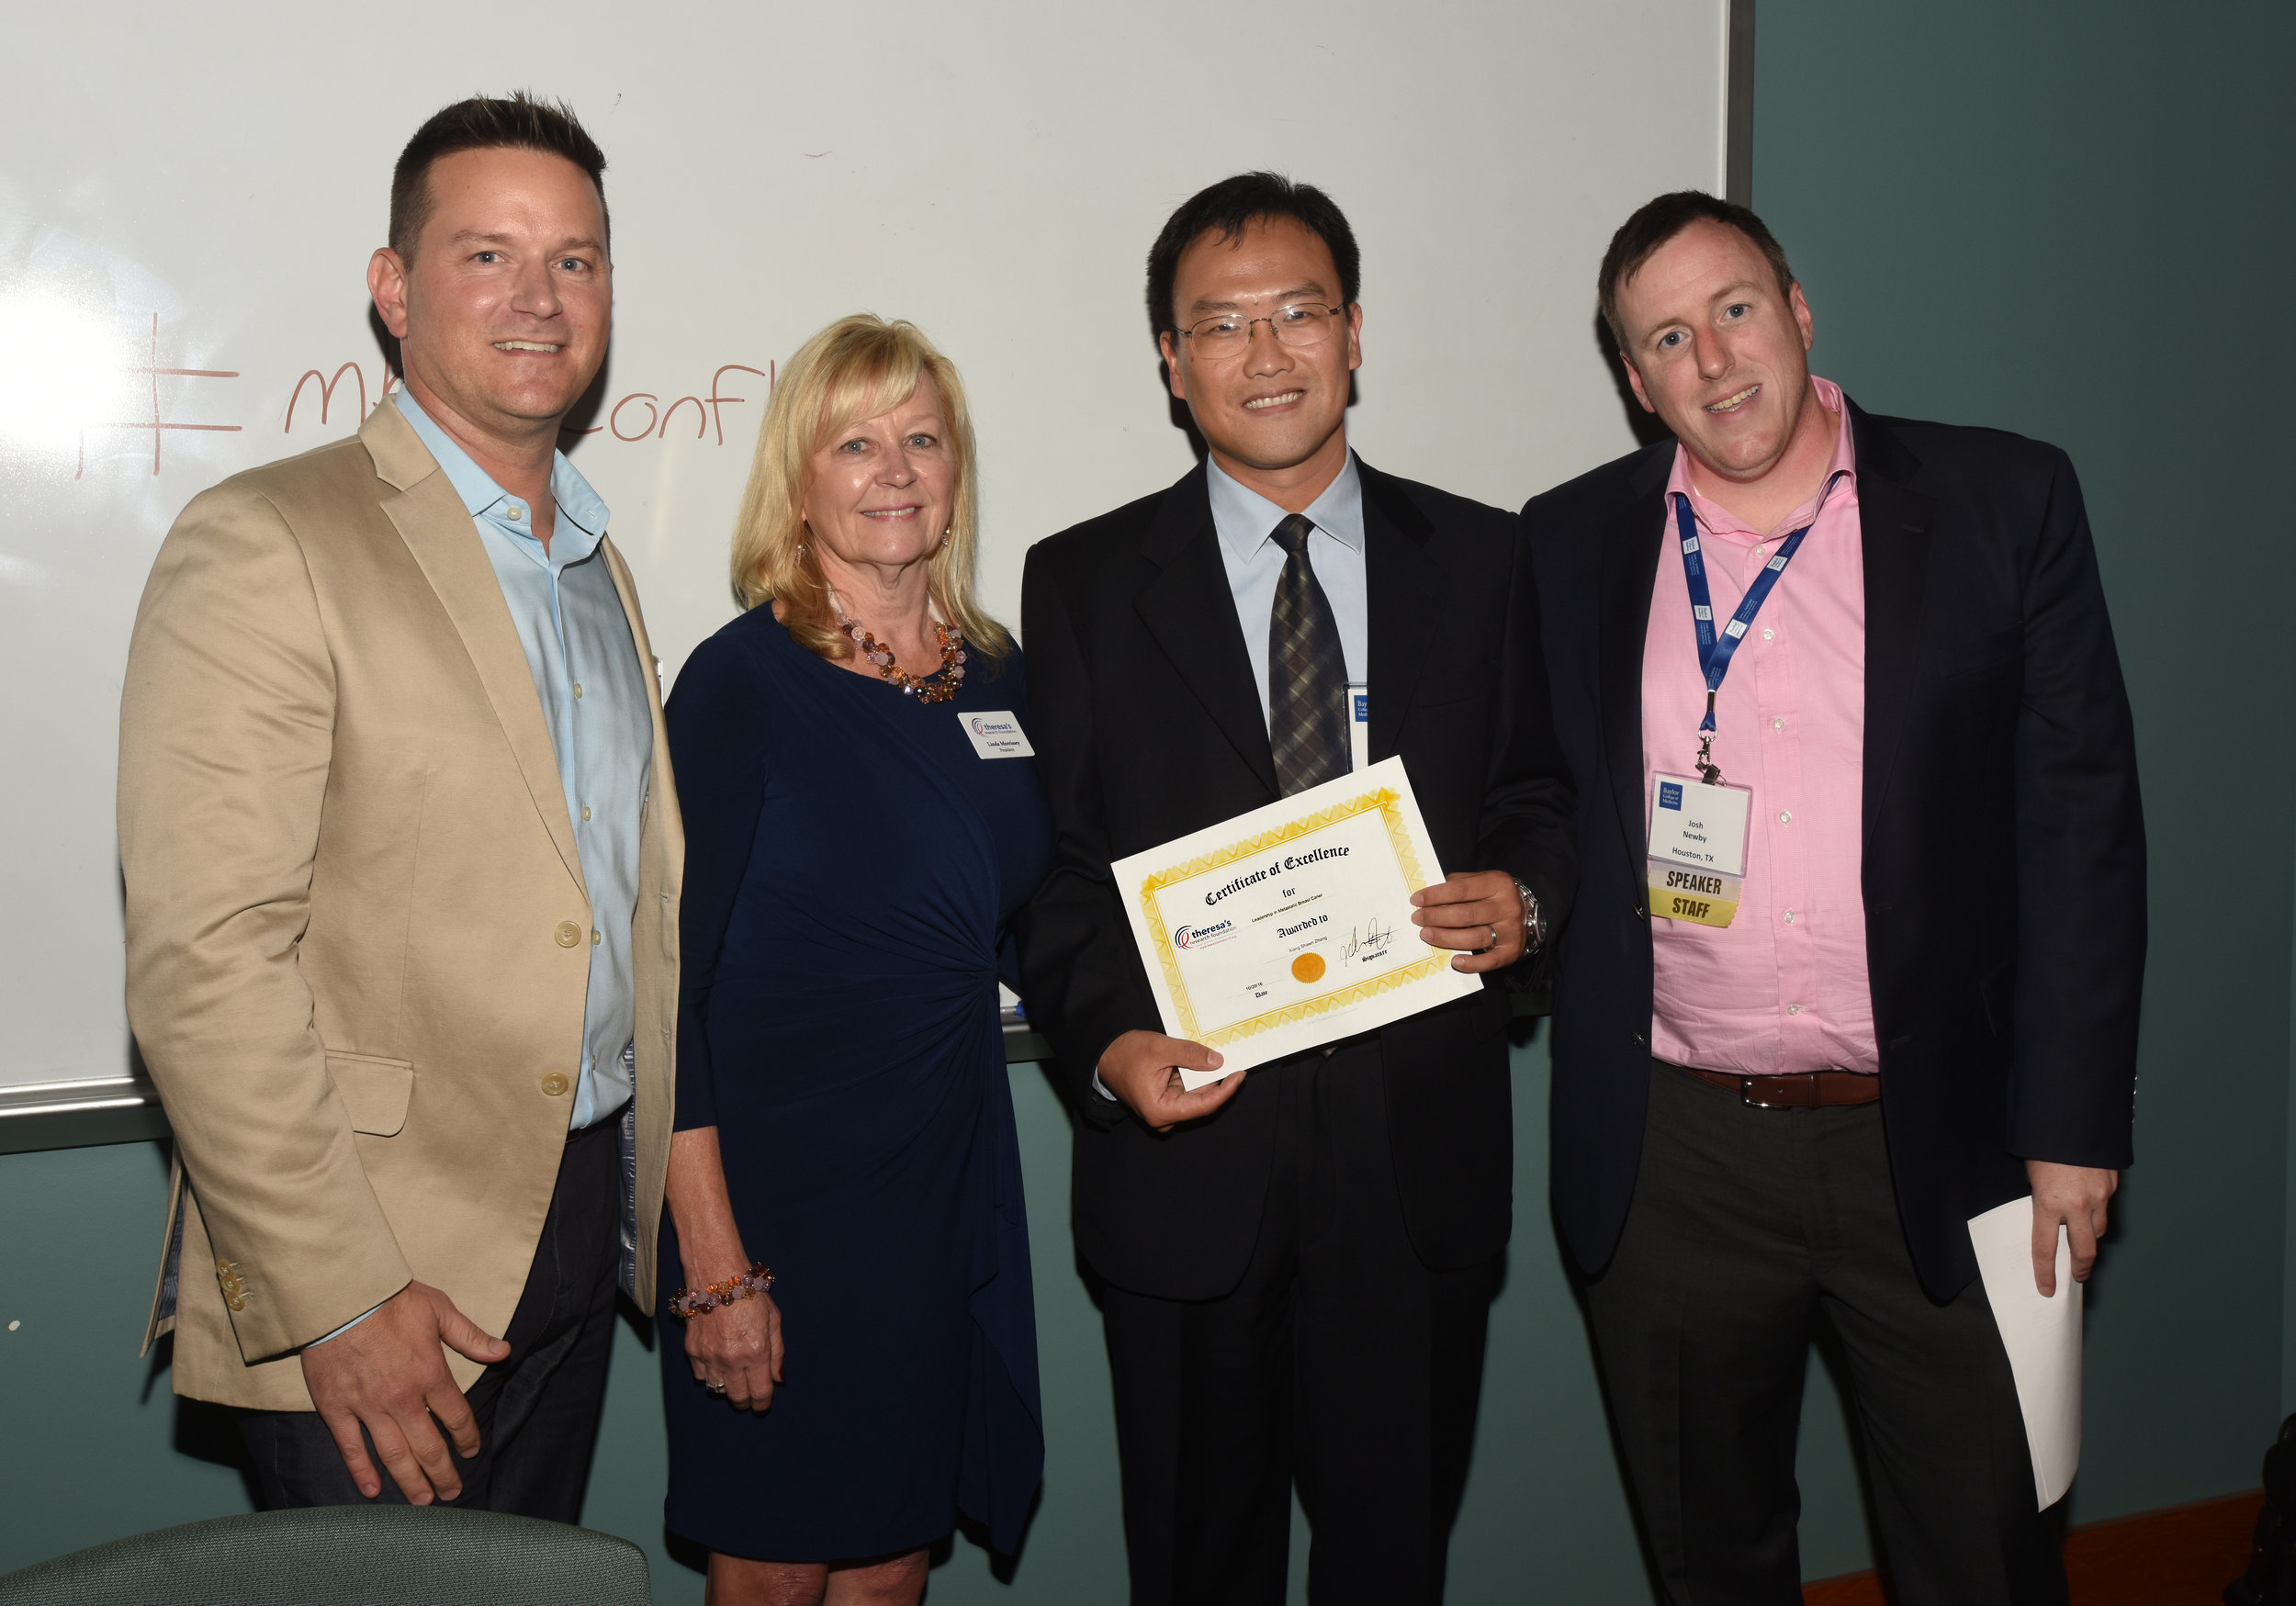 The 2016 award recipient was Dr. Xiang Zhang, PHD